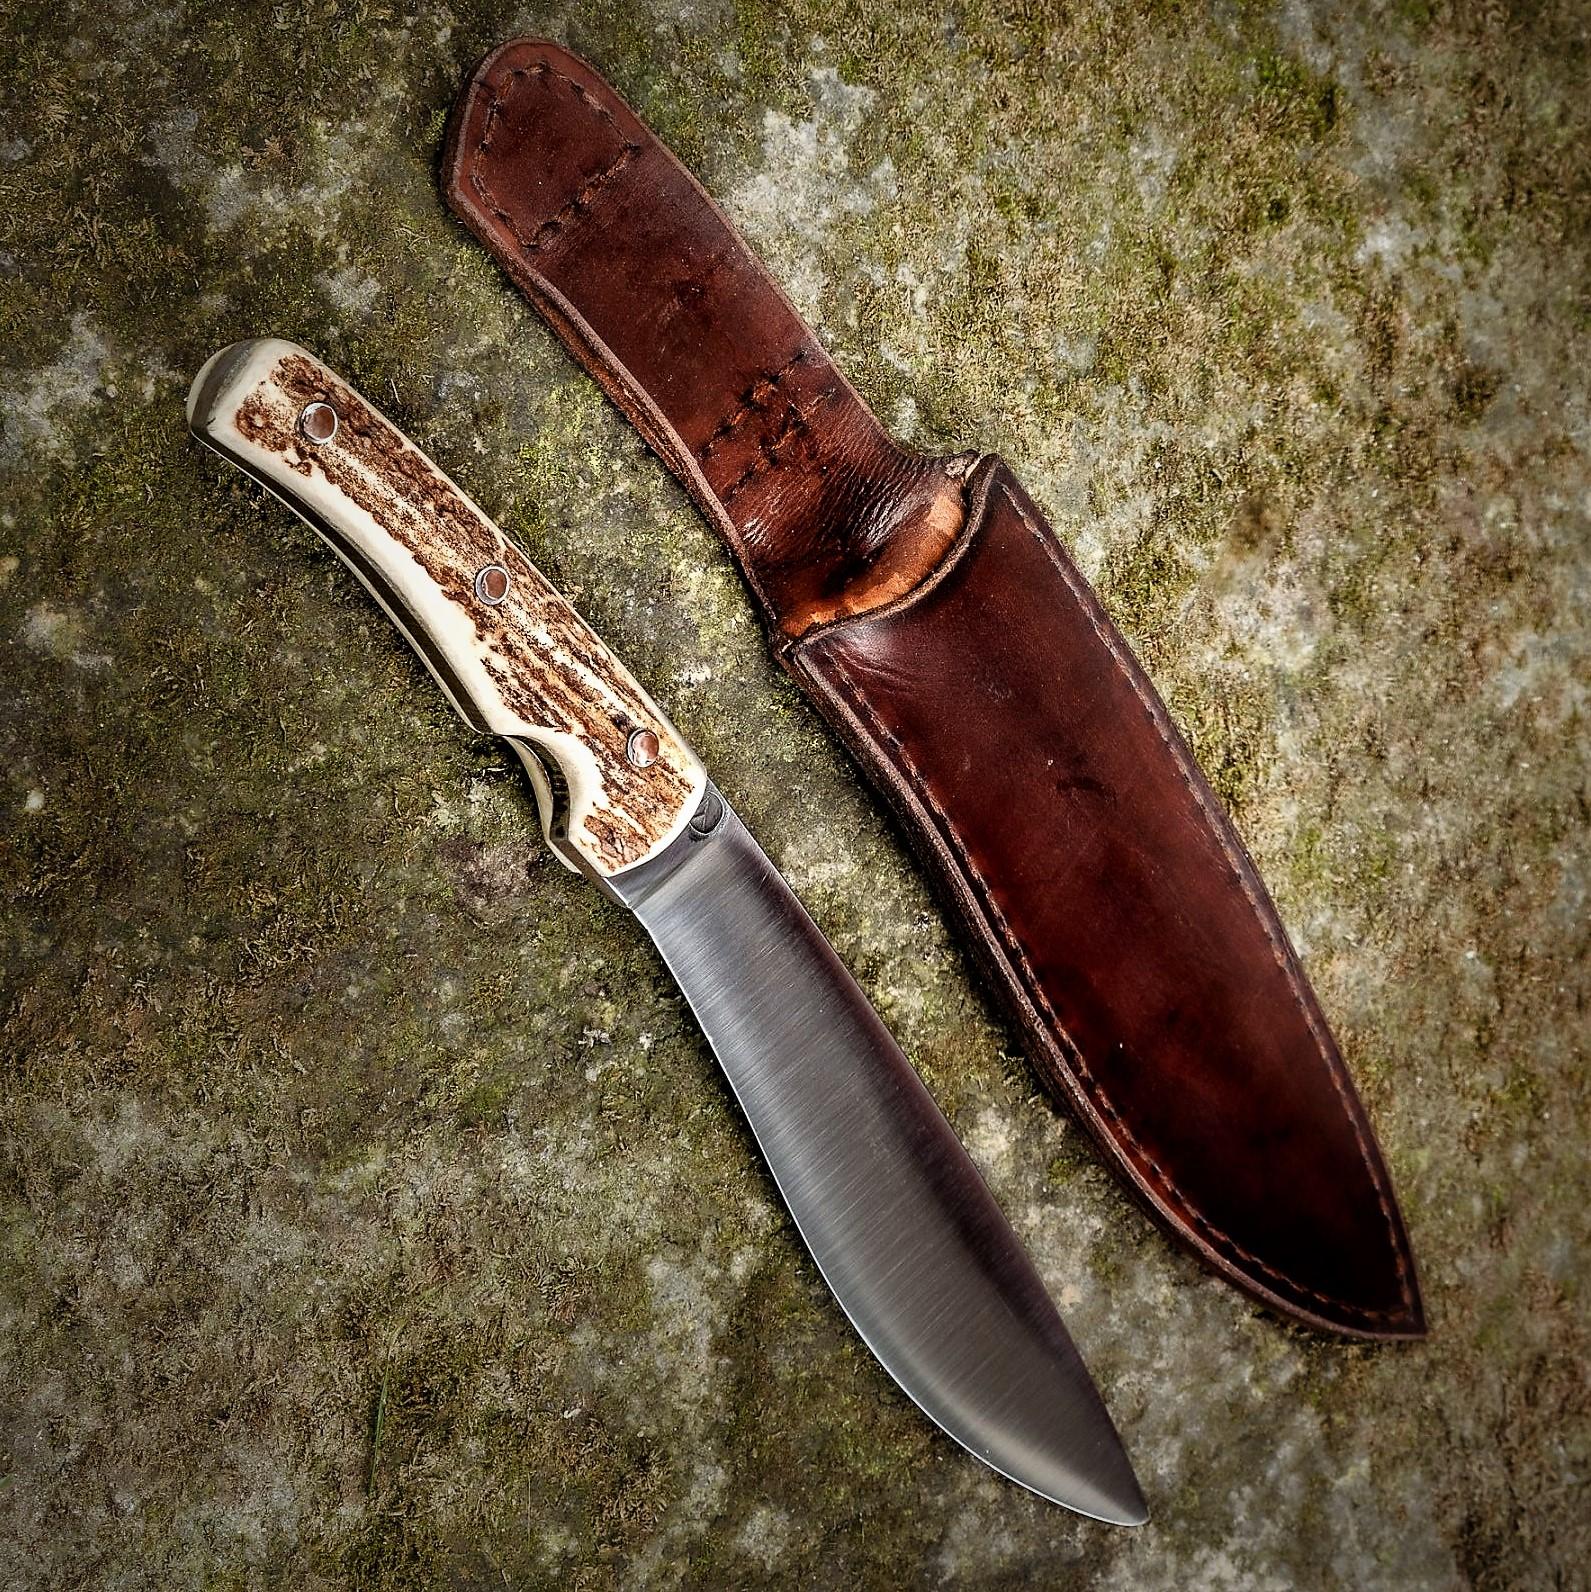 Buckhorn Handle and Leather Sheath